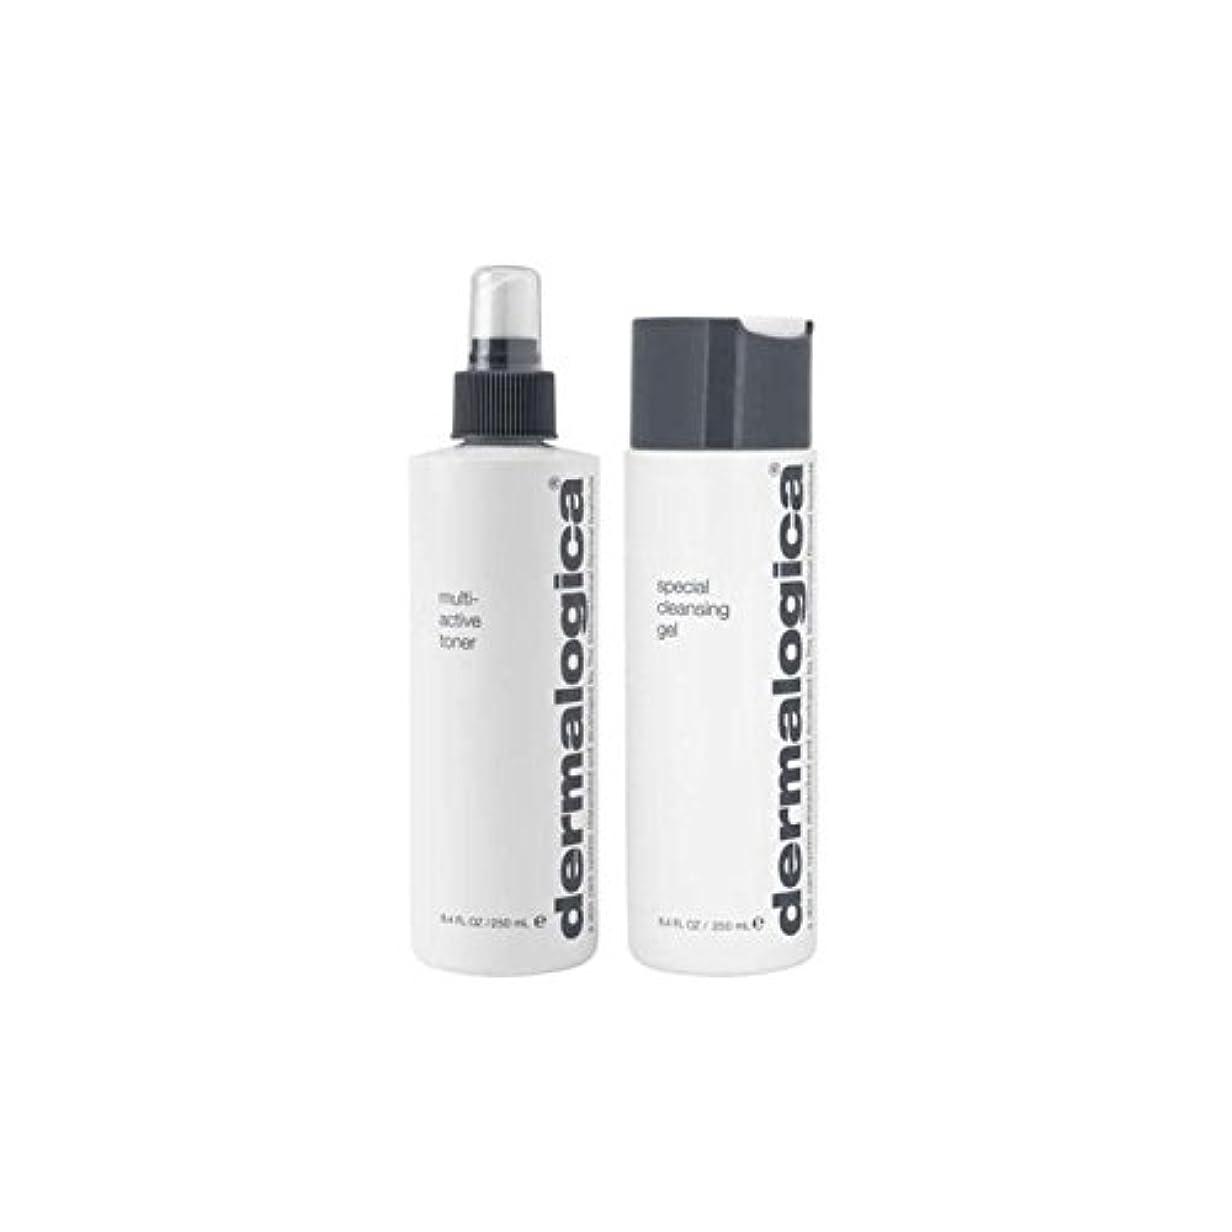 Dermalogica Cleanse & Tone Duo - Normal/Dry Skin (2 Products) - ダーマロジカクレンジング&トーンデュオ - ノーマル/ドライスキン(2製品) [並行輸入品]